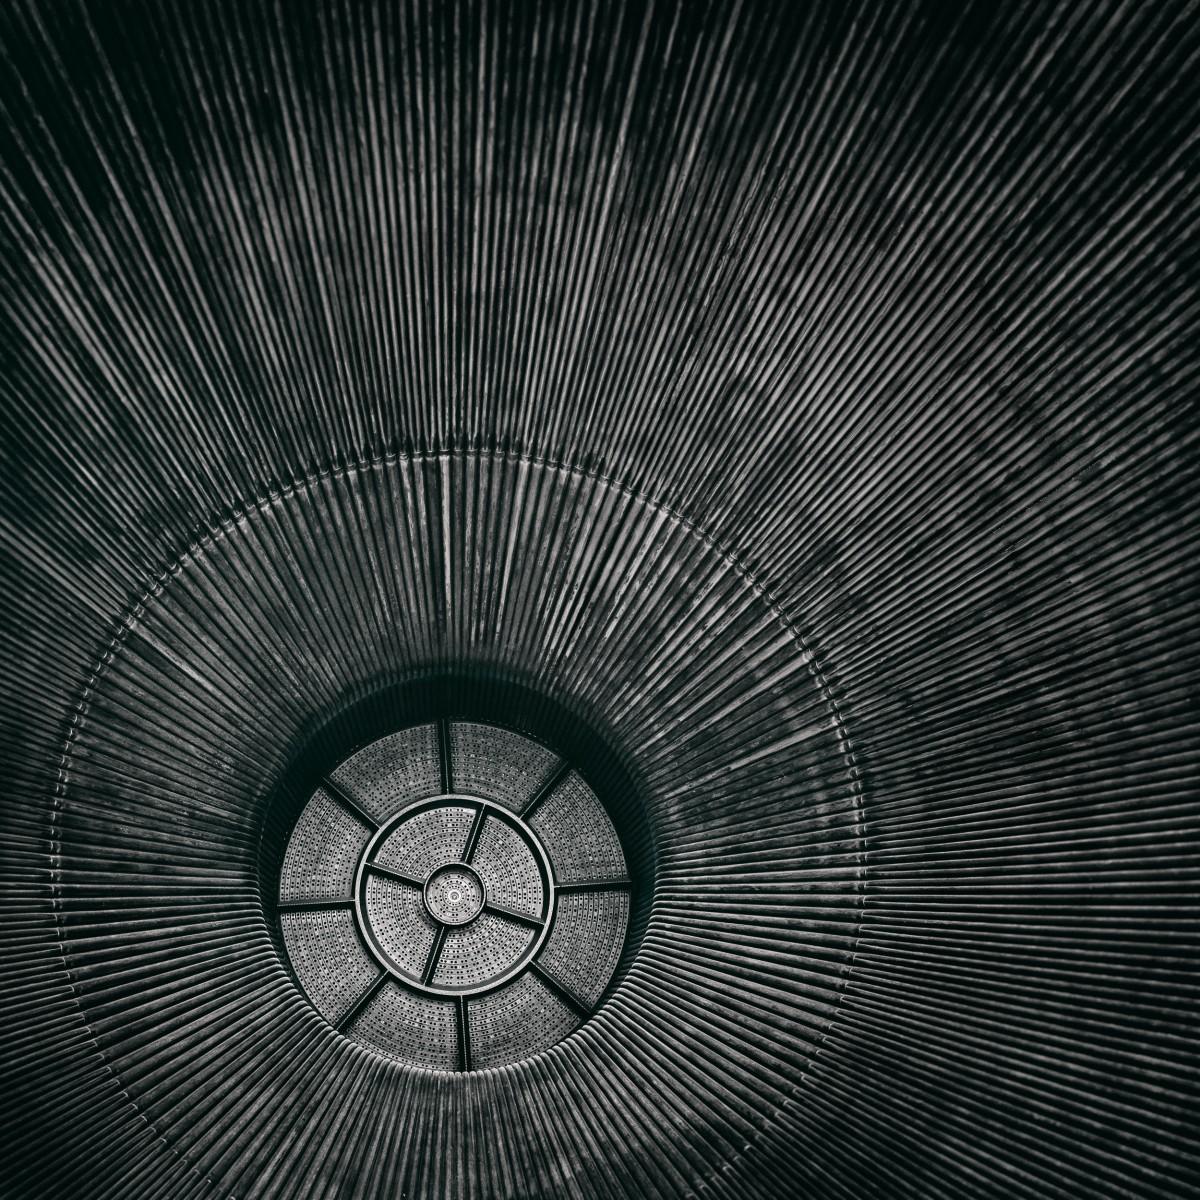 Saturn V #4 by Morgan Silk